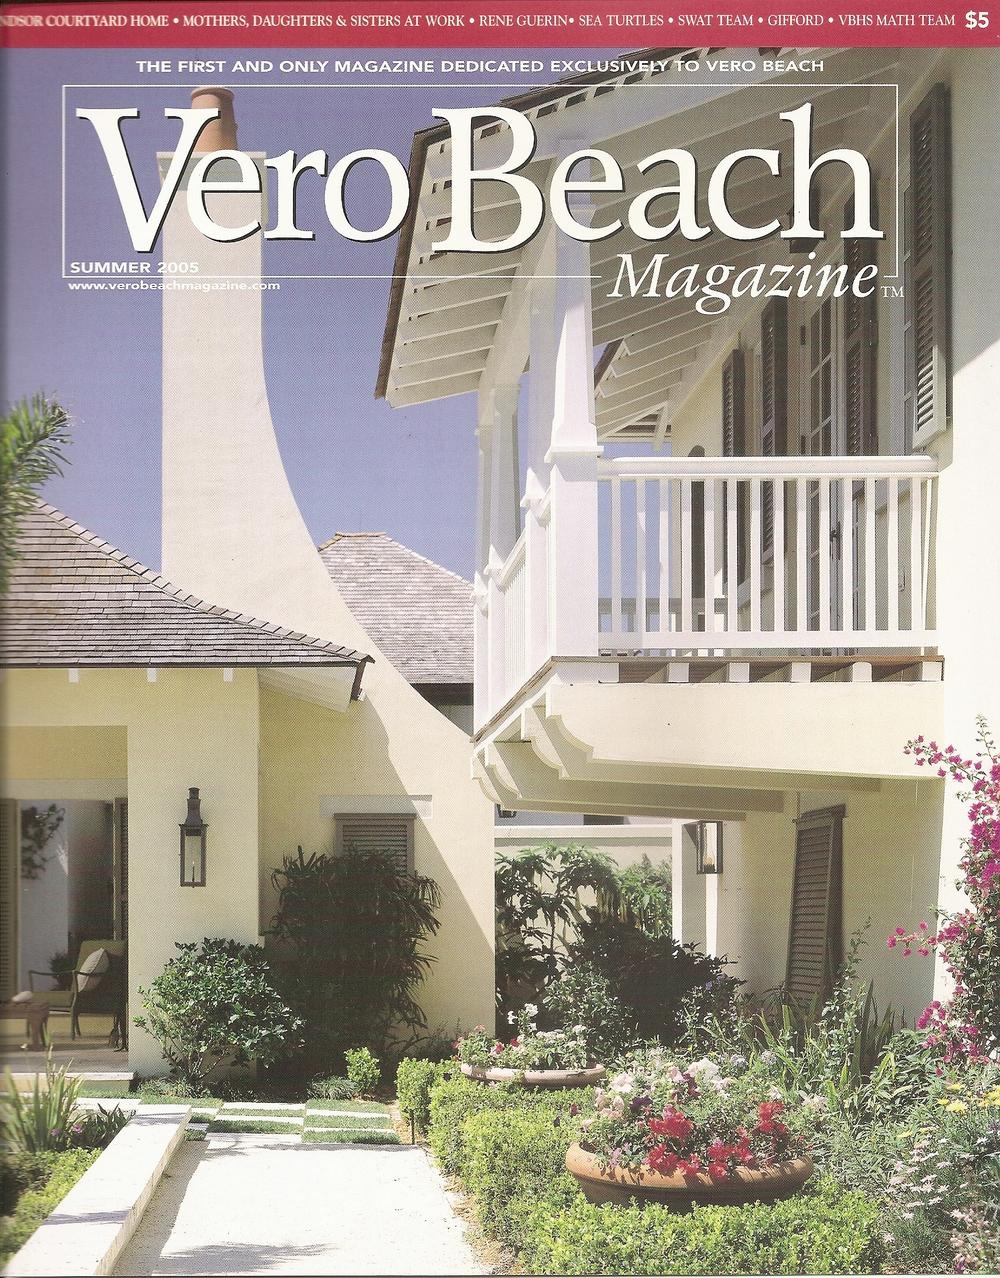 Vero Beach Magazine  | Summer 2005 | Windsor Courtyard Home